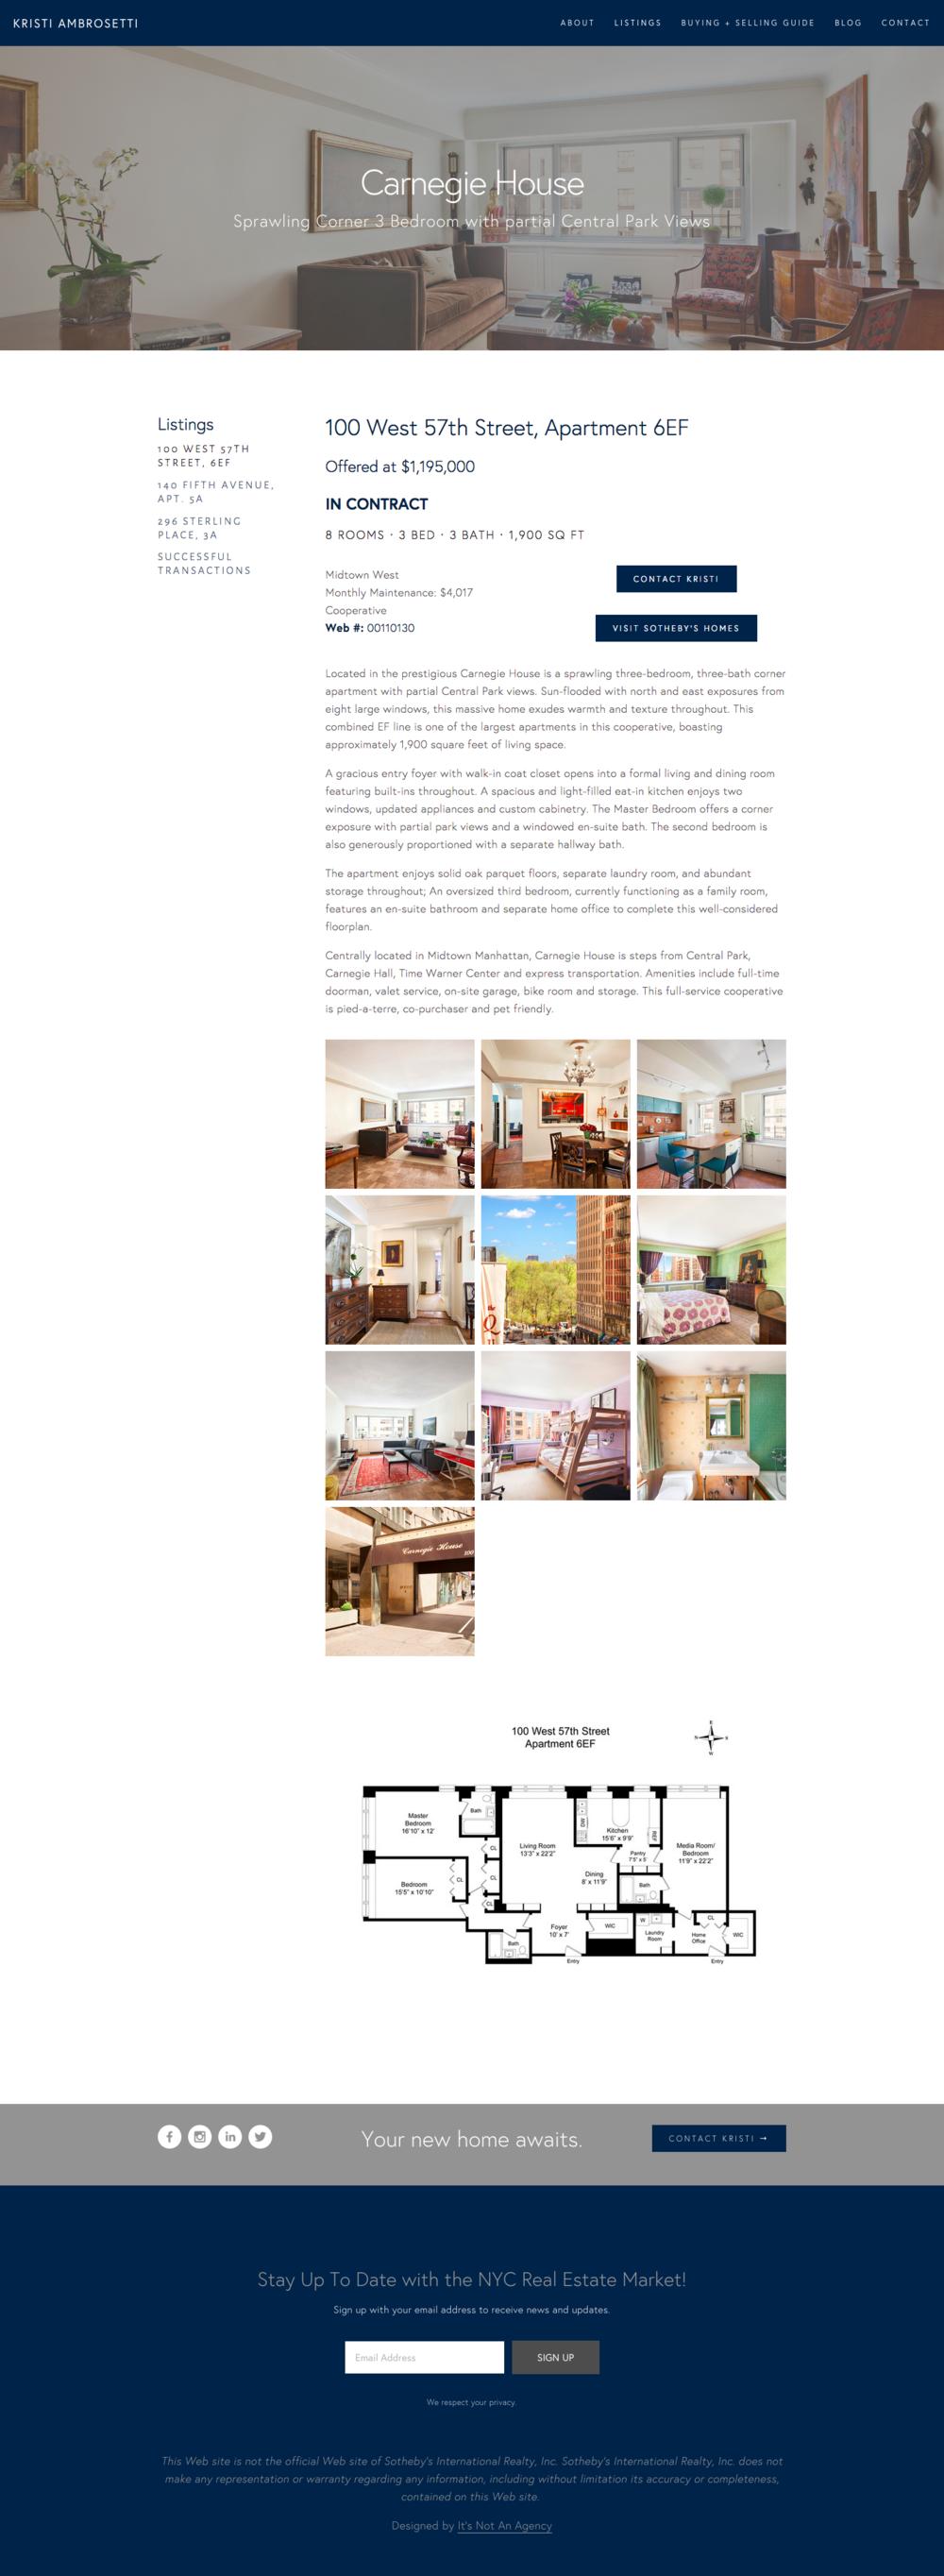 Real Estate Website_Kristi Ambrosetti1.png